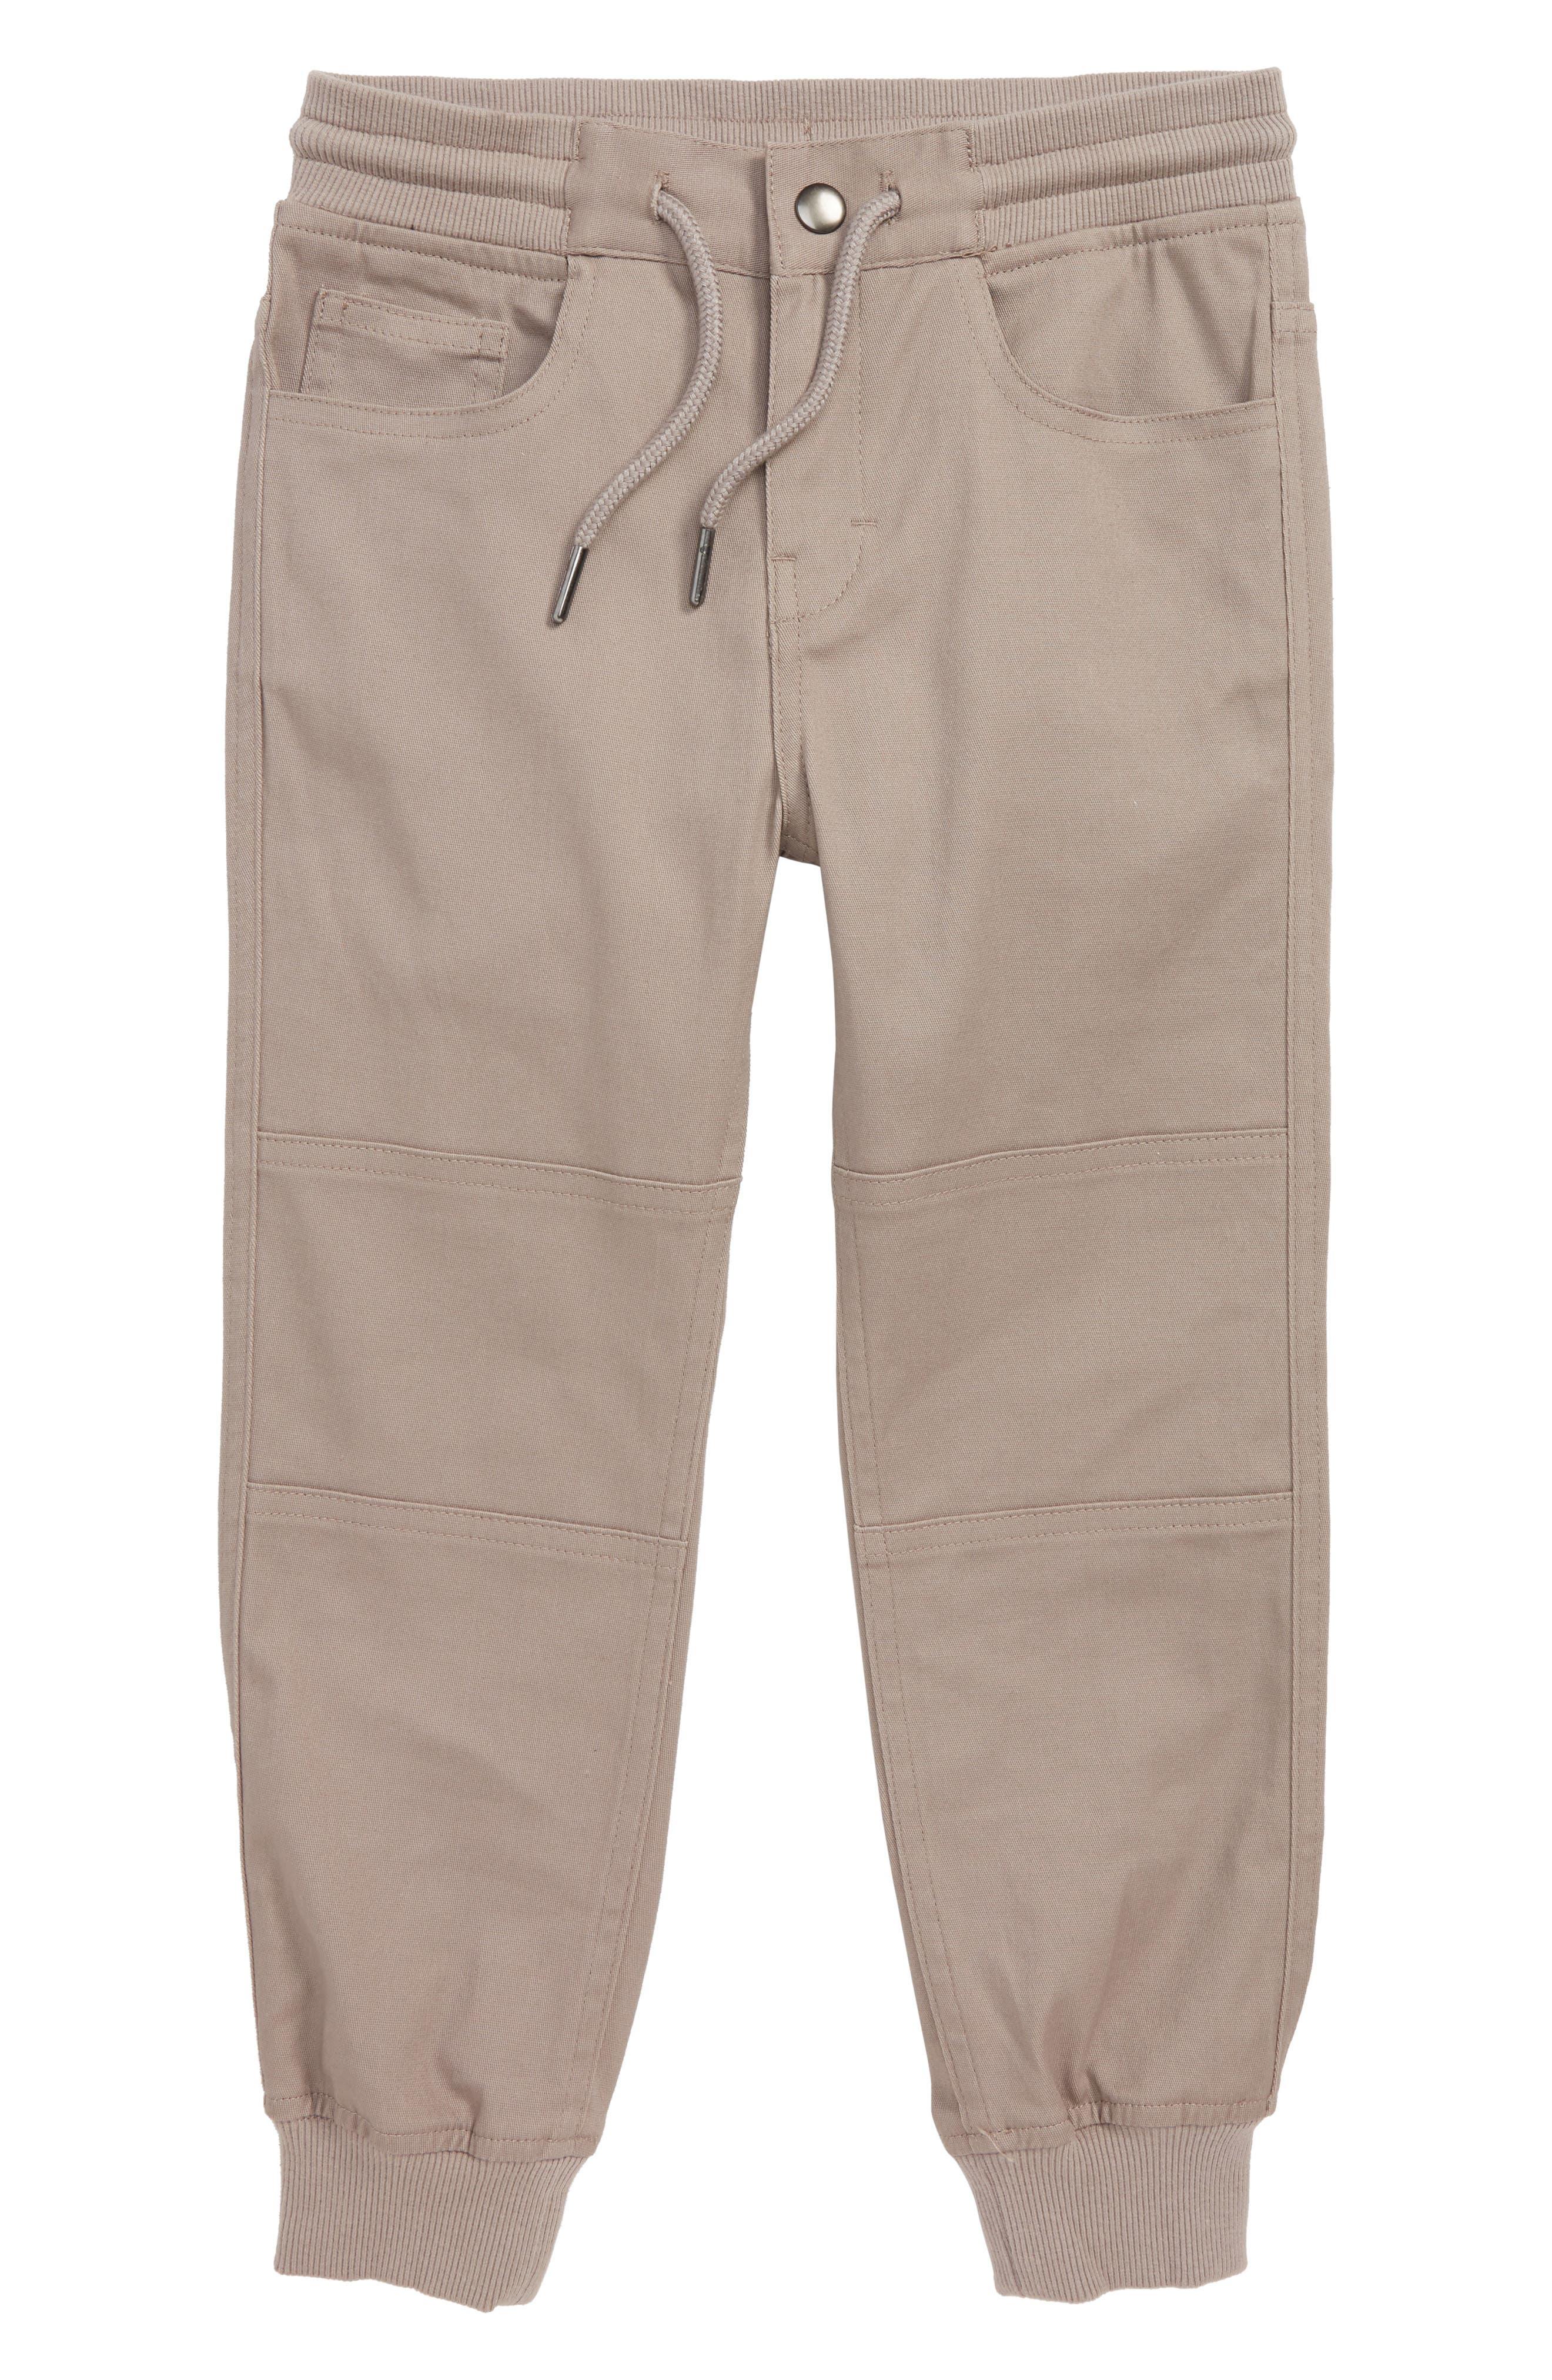 Aiden Jogger Pants,                         Main,                         color, GREY